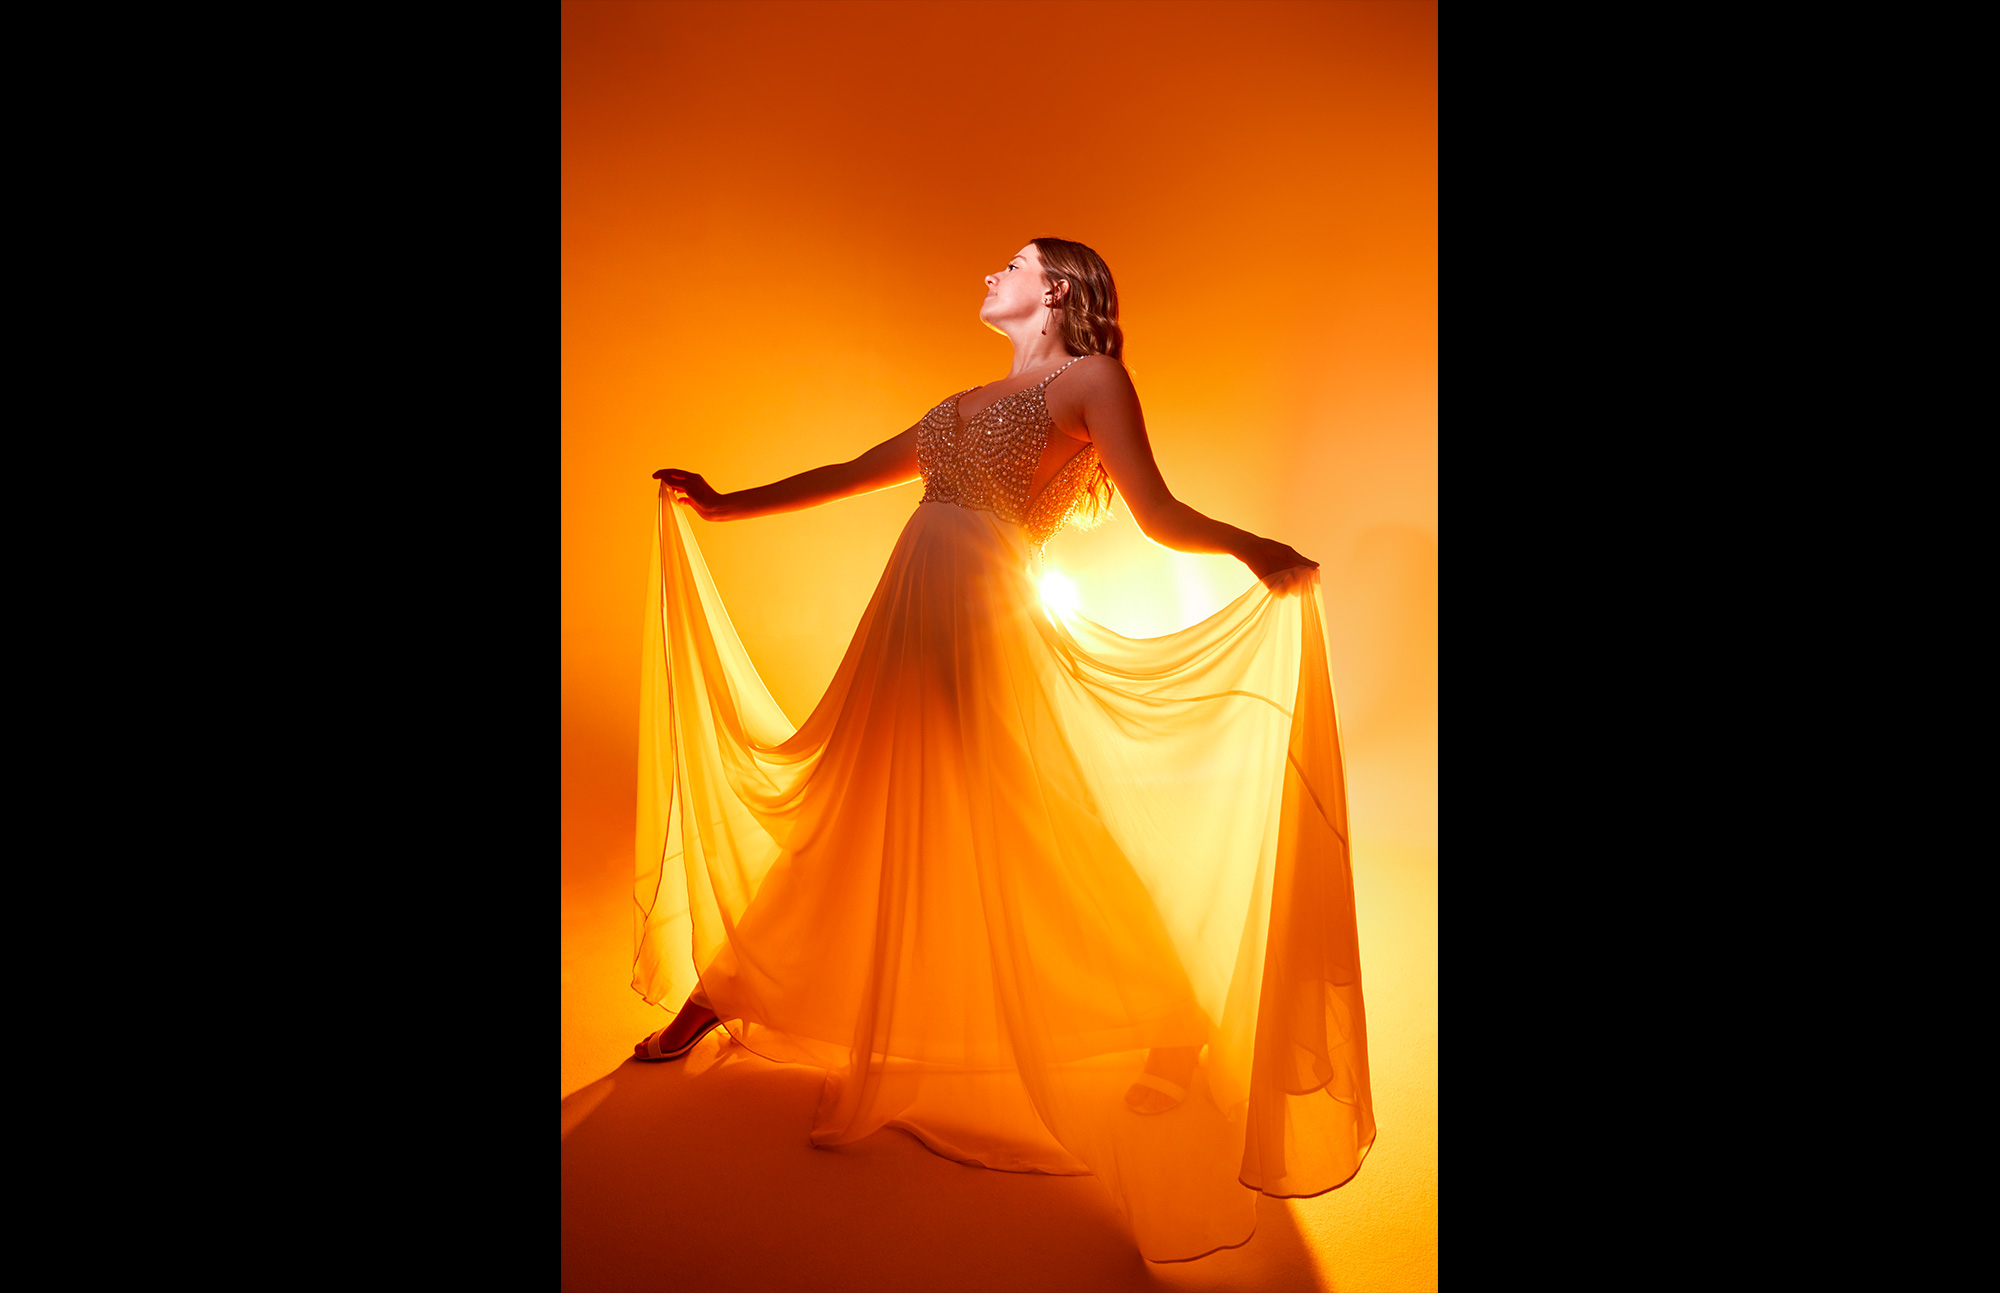 woman in studio with orange light